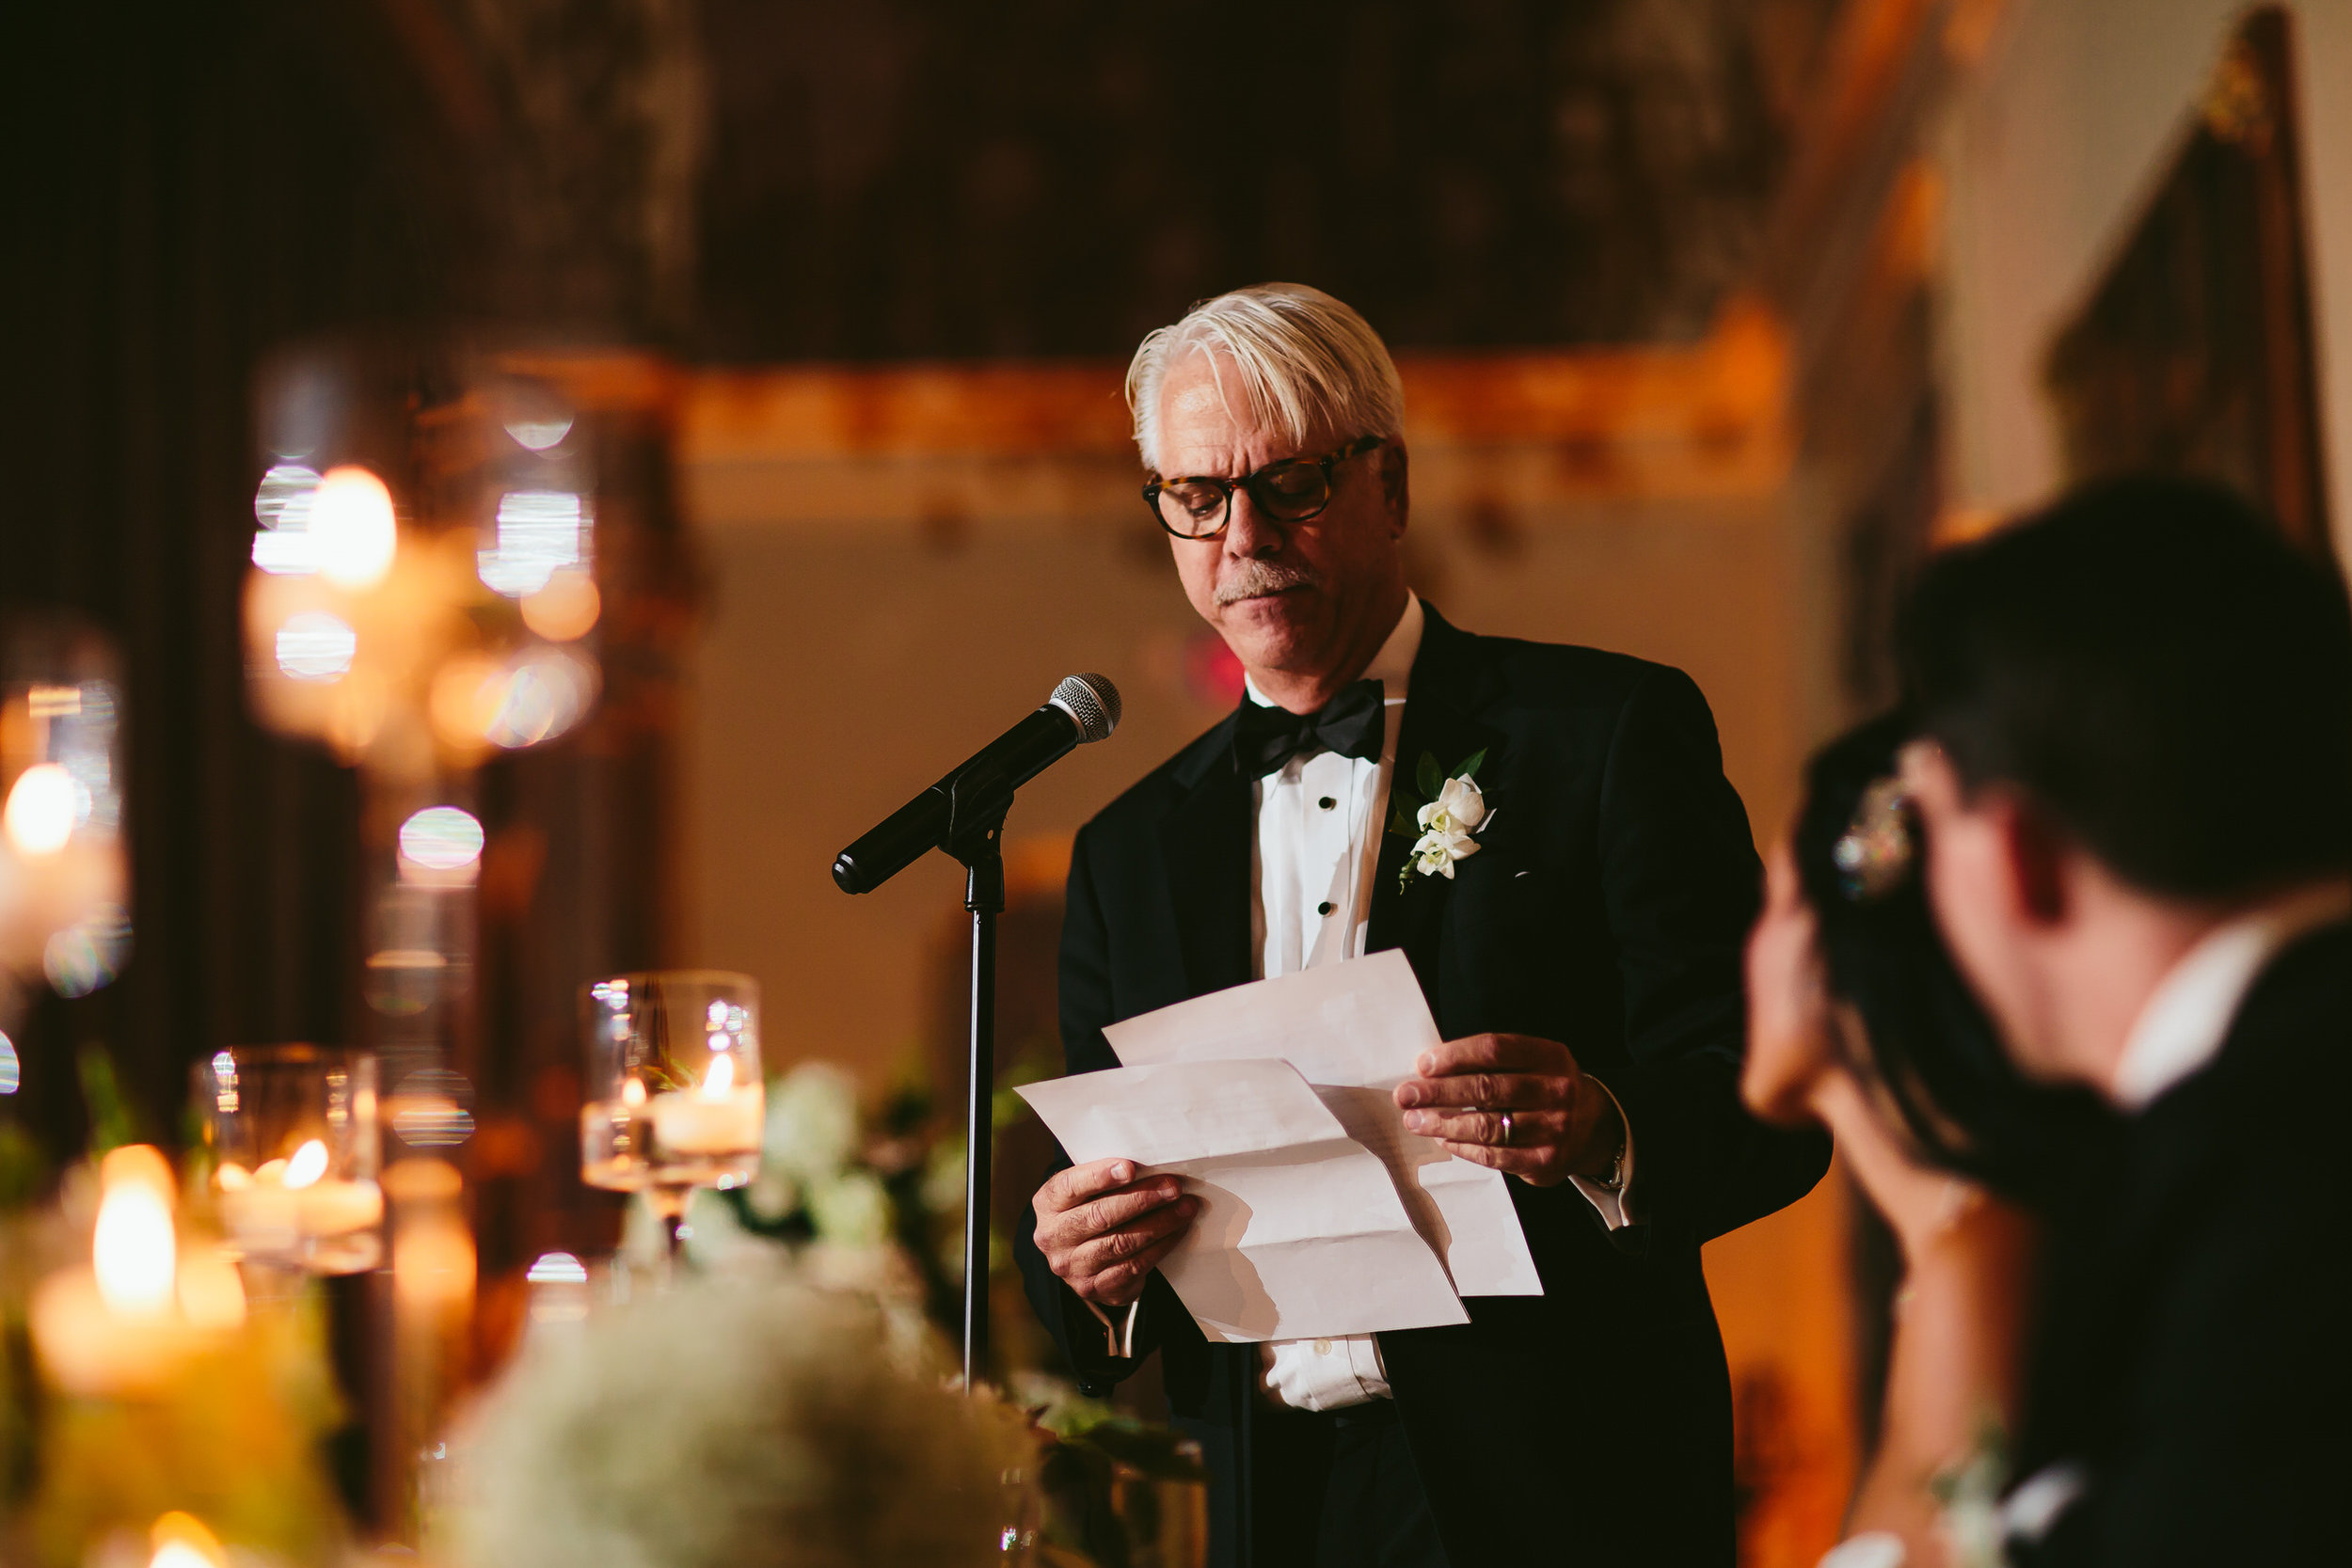 miami-biltmore-wedding-photographer-reception-party-13.jpg